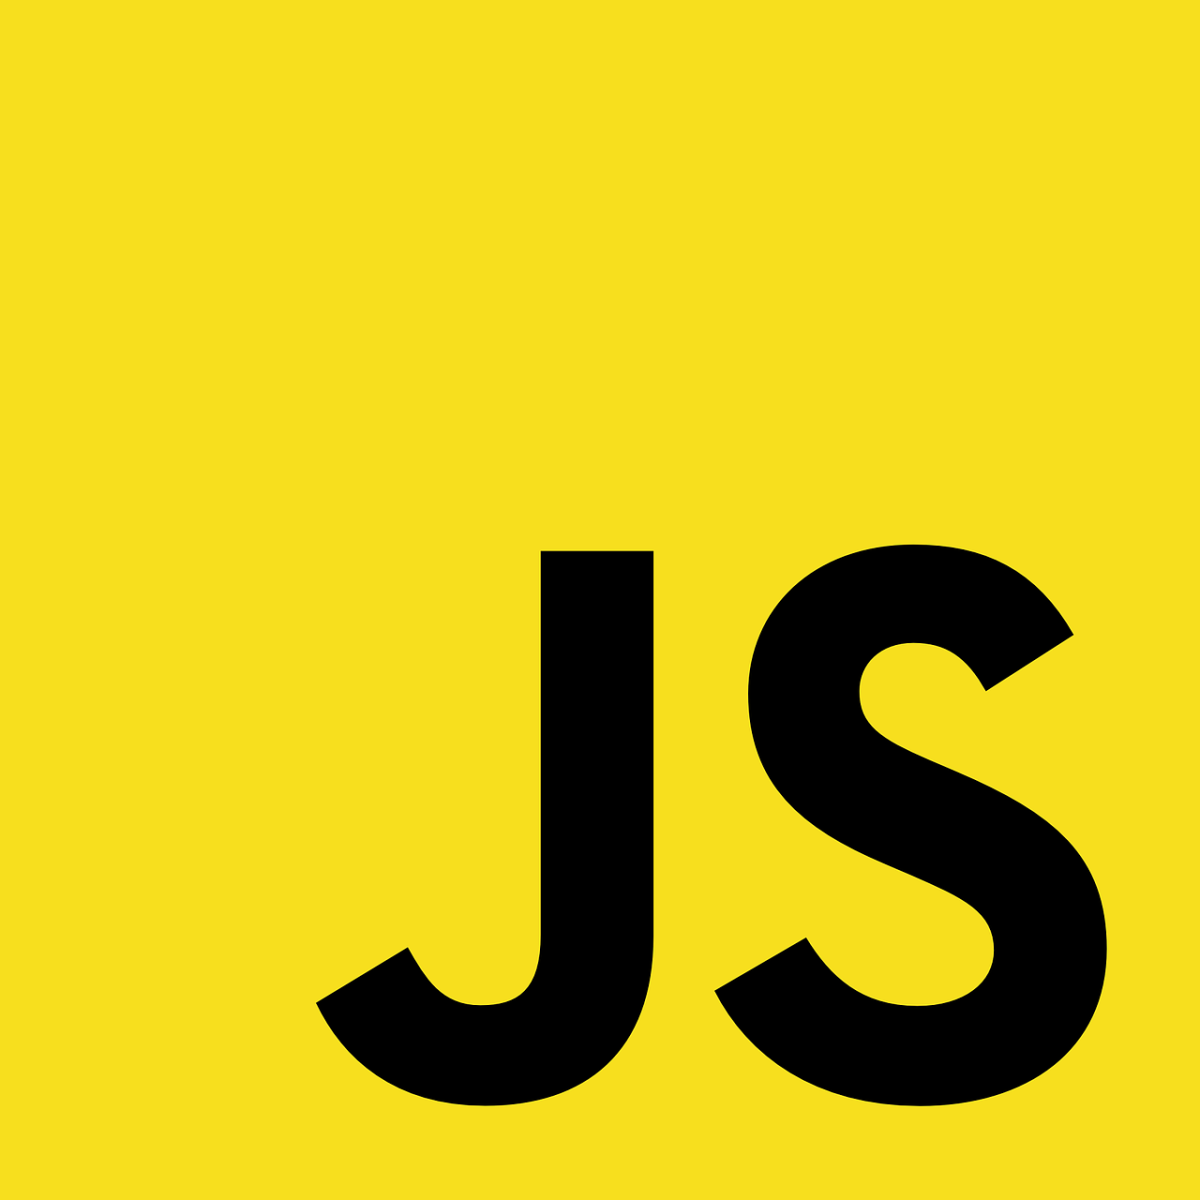 javascript-arithmetic-operators